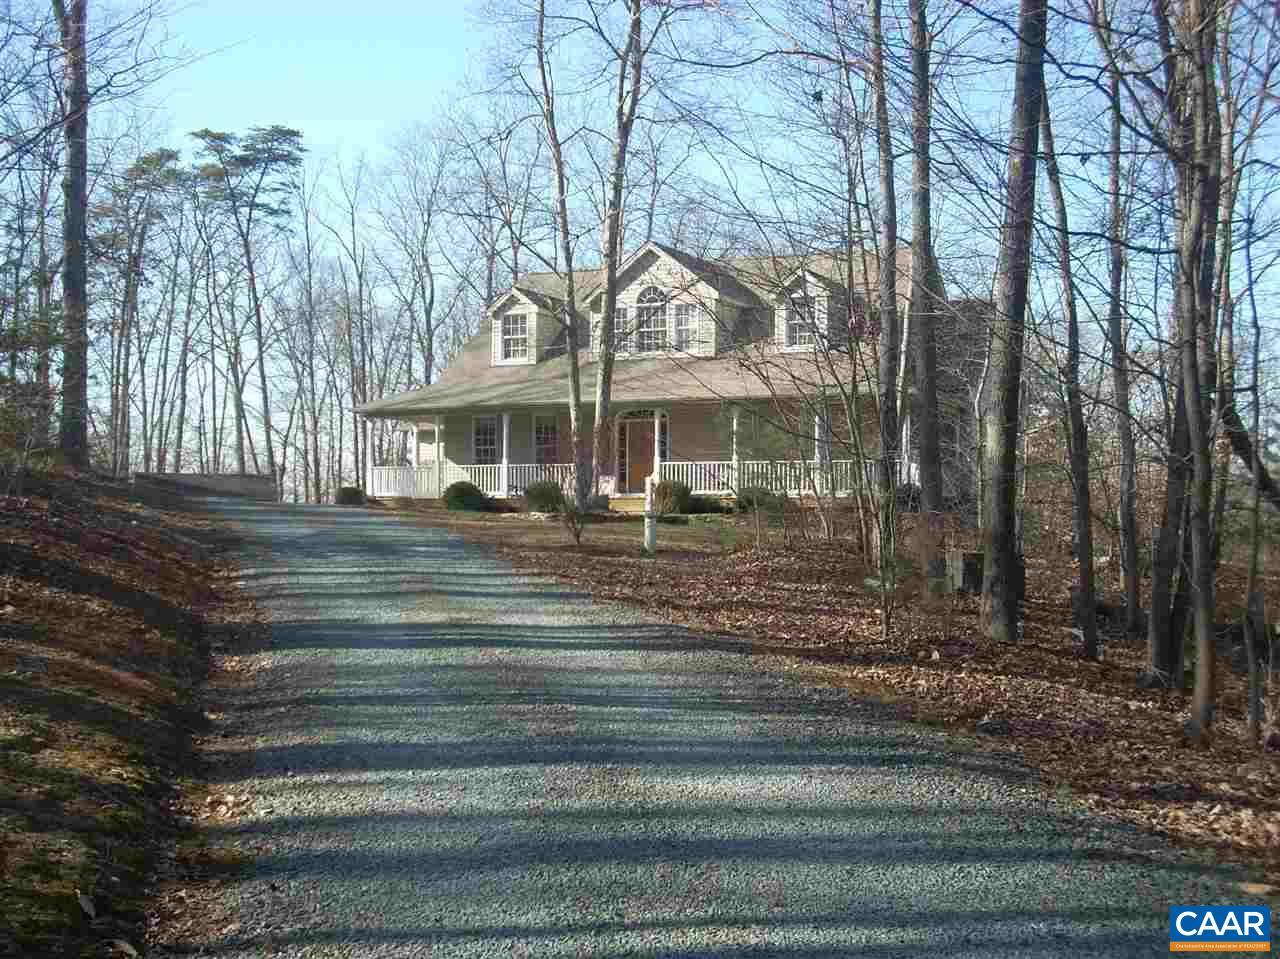 Single Family Home for Sale at 234 FAIRVIEW Lane 234 FAIRVIEW Lane Palmyra, Virginia 22963 United States